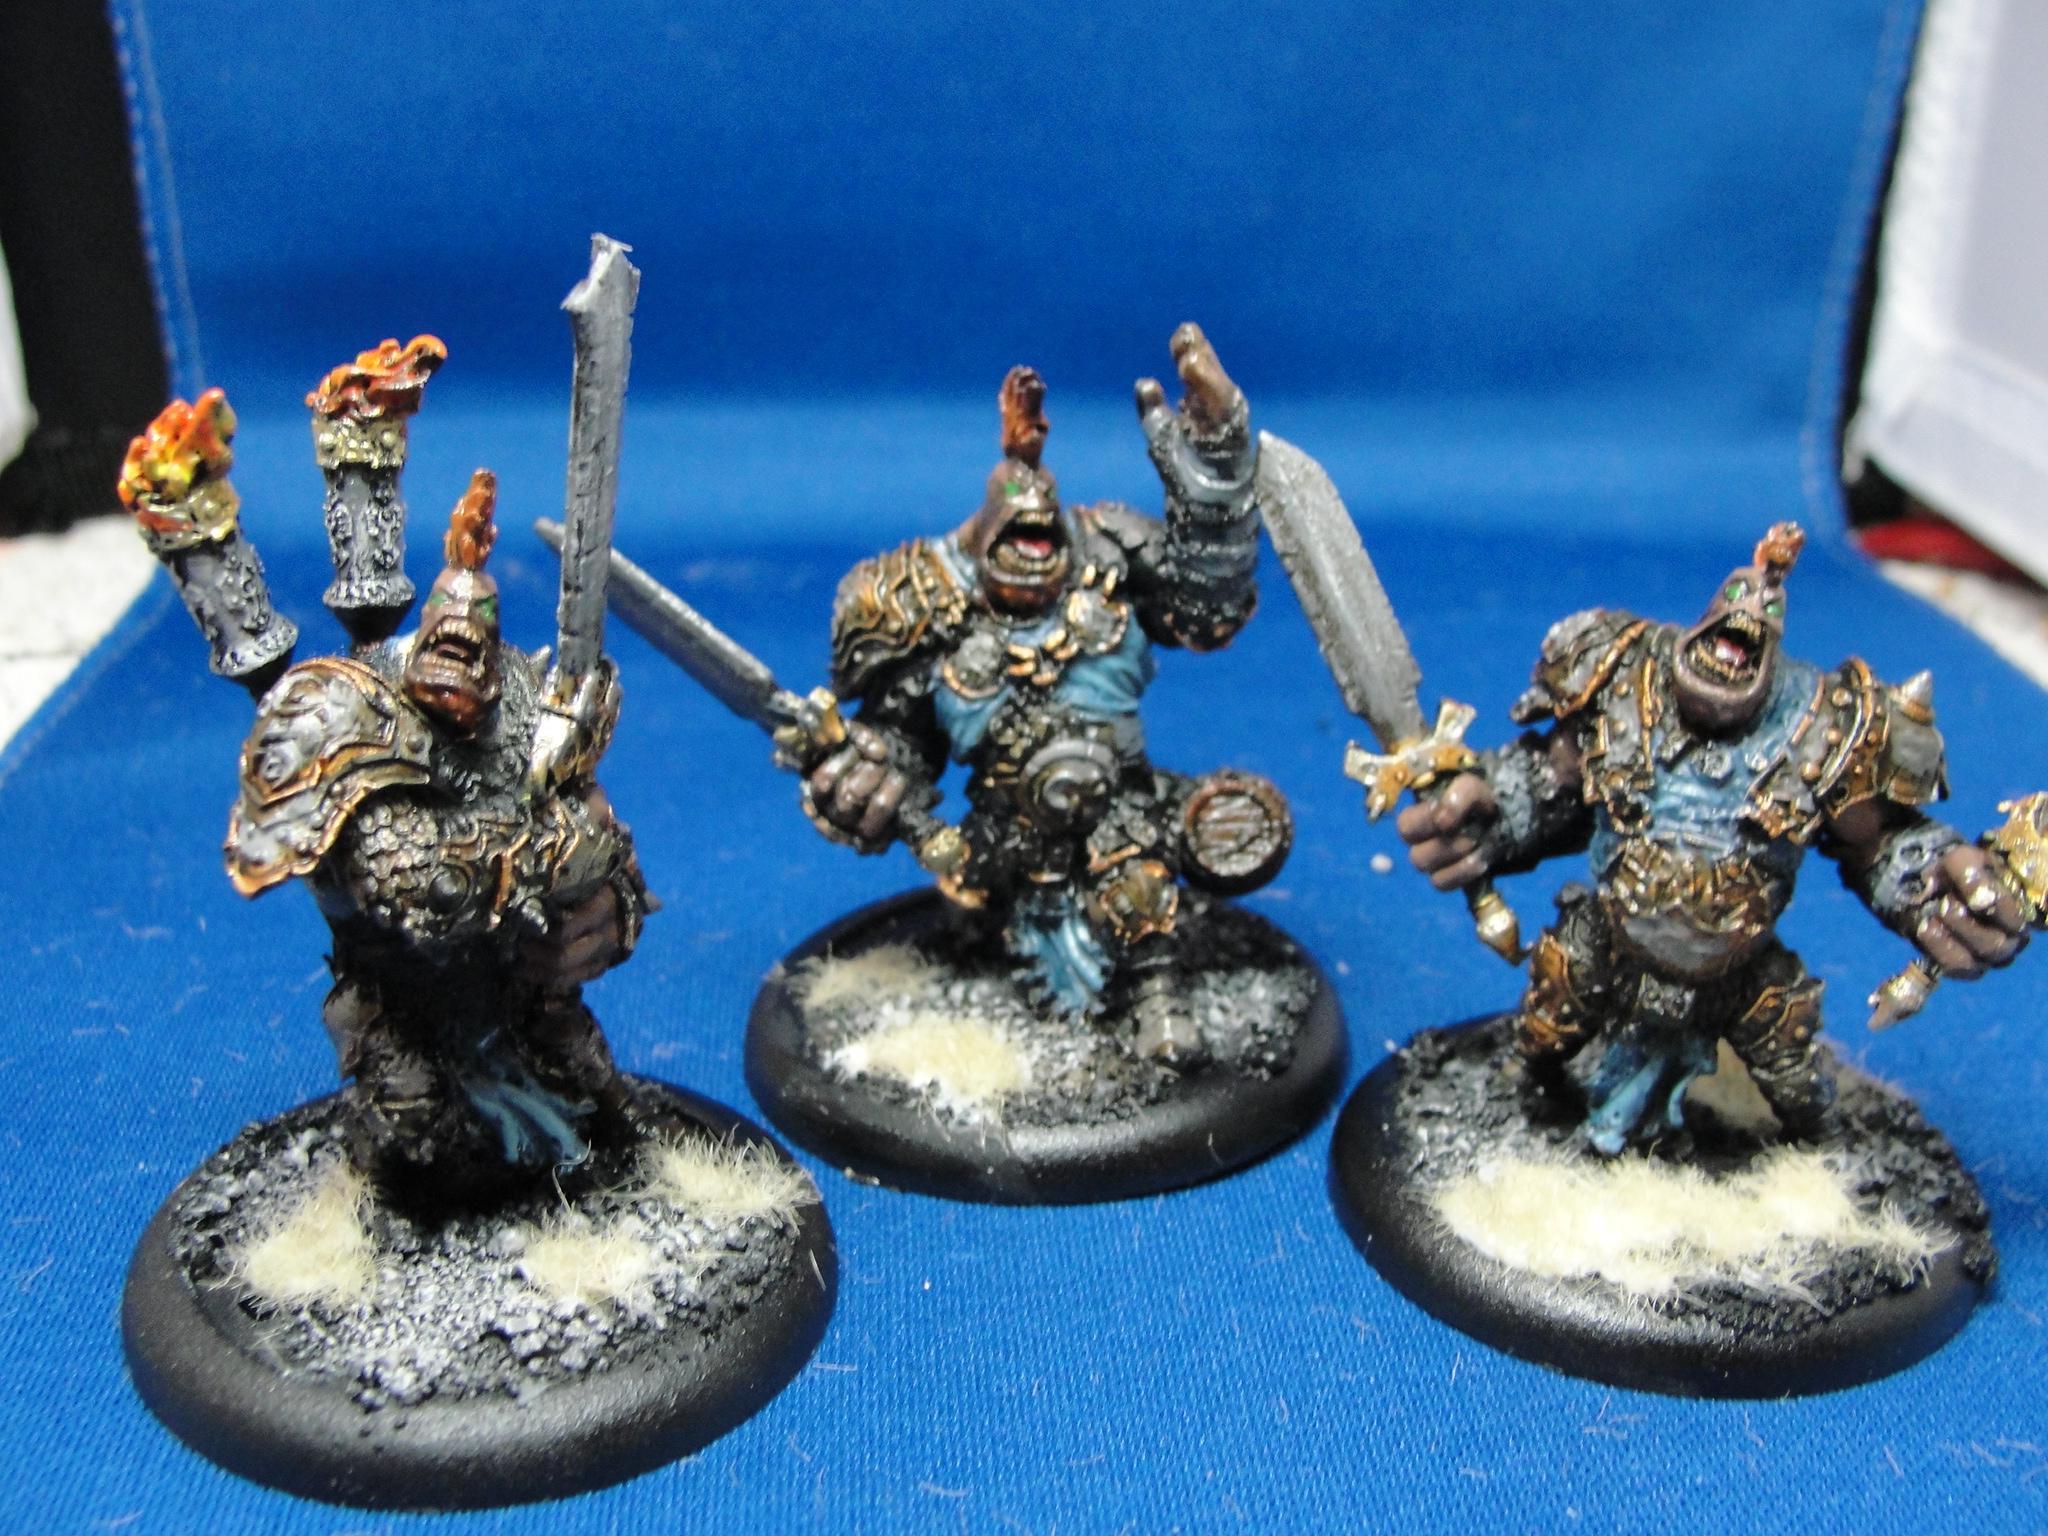 Hordes, Trollbloods, Sons of Bragg